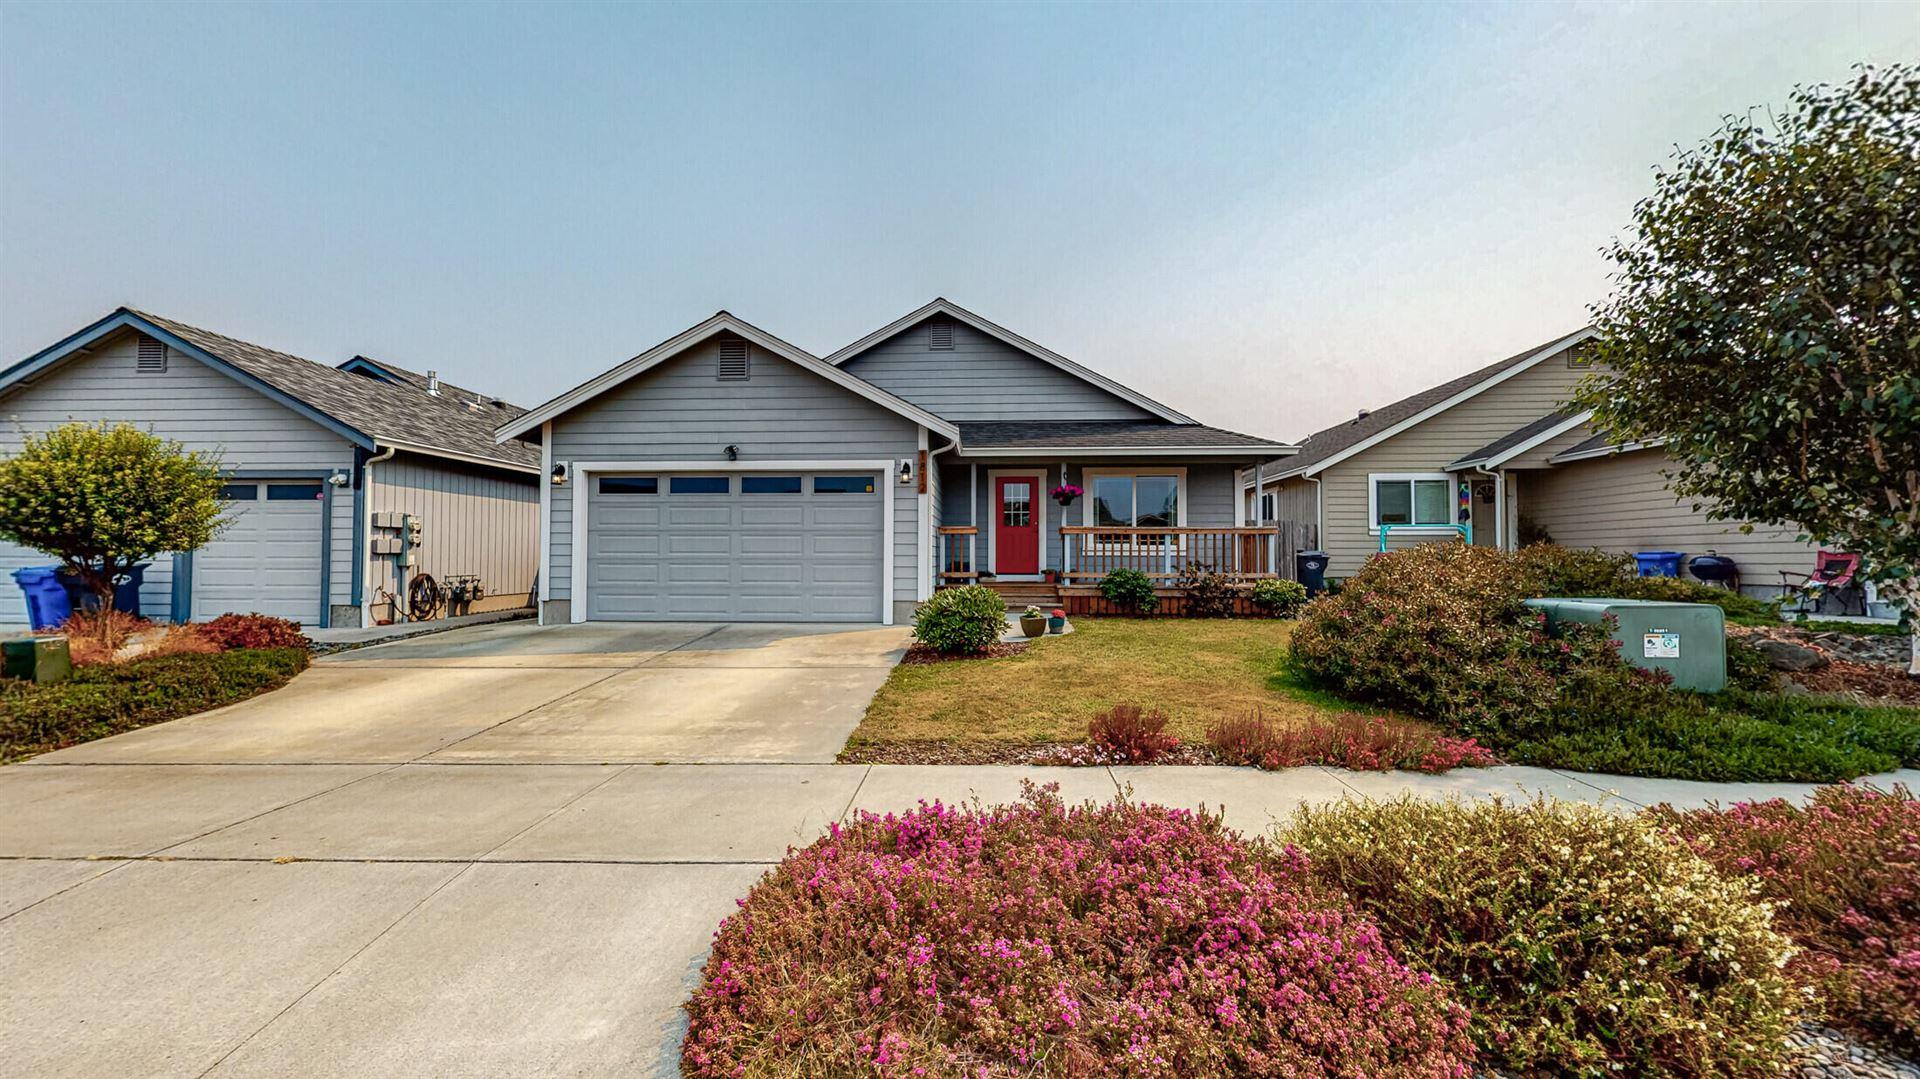 1812 Maplewood Drive, McKinleyville, CA 95519 - MLS#: 260108